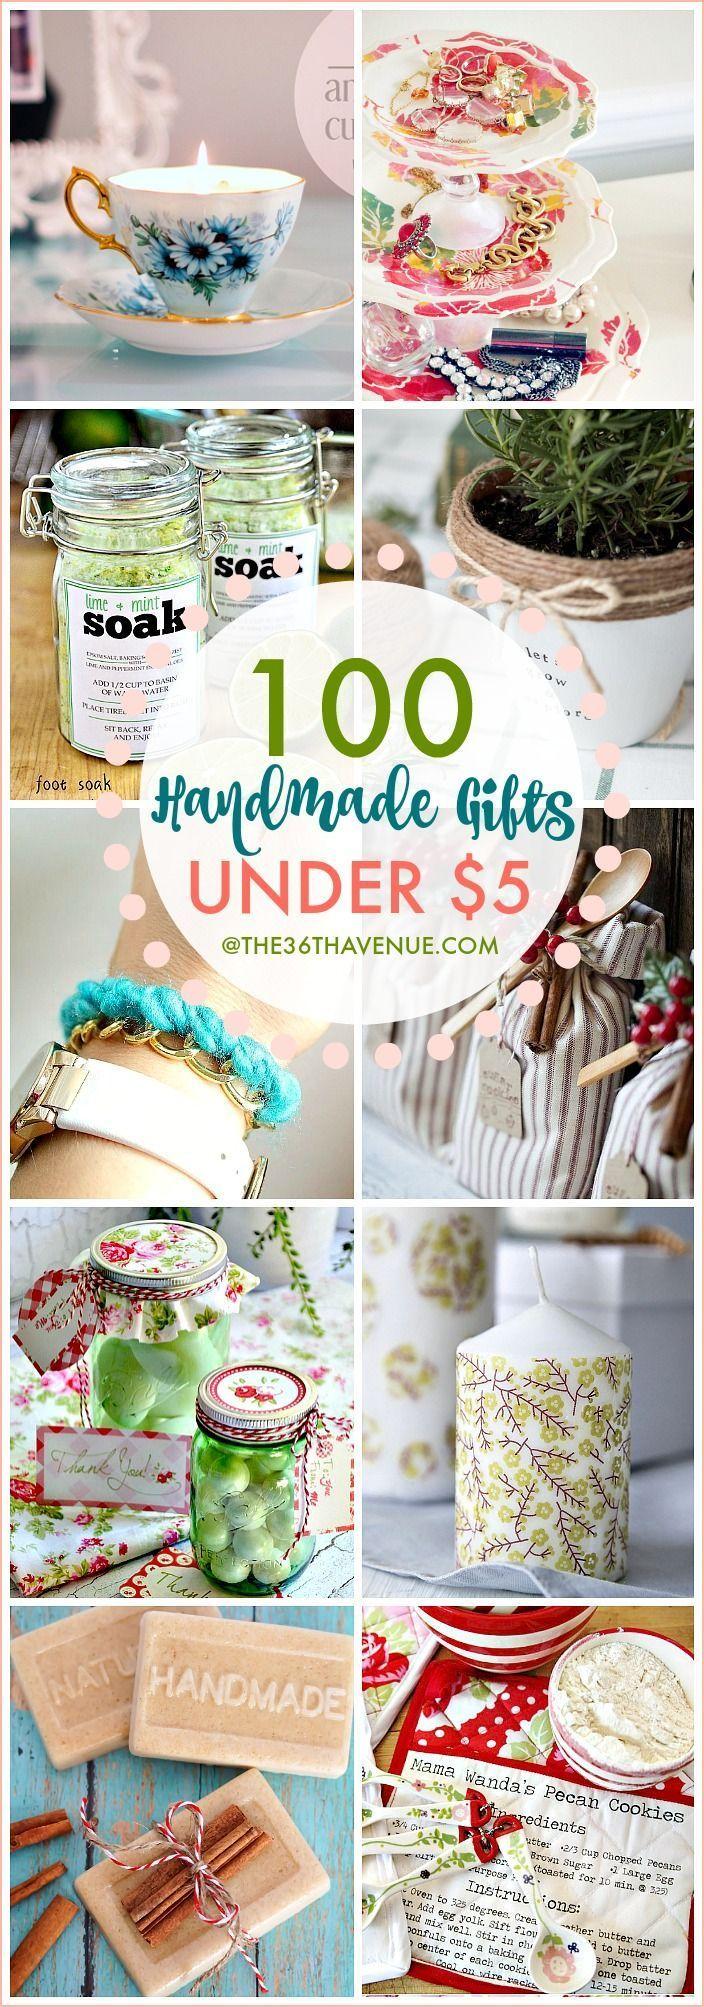 100 Handmade Gifts Under Five Dollars Easy Handmade Gifts Homemade Christmas Gifts Homemade Gifts